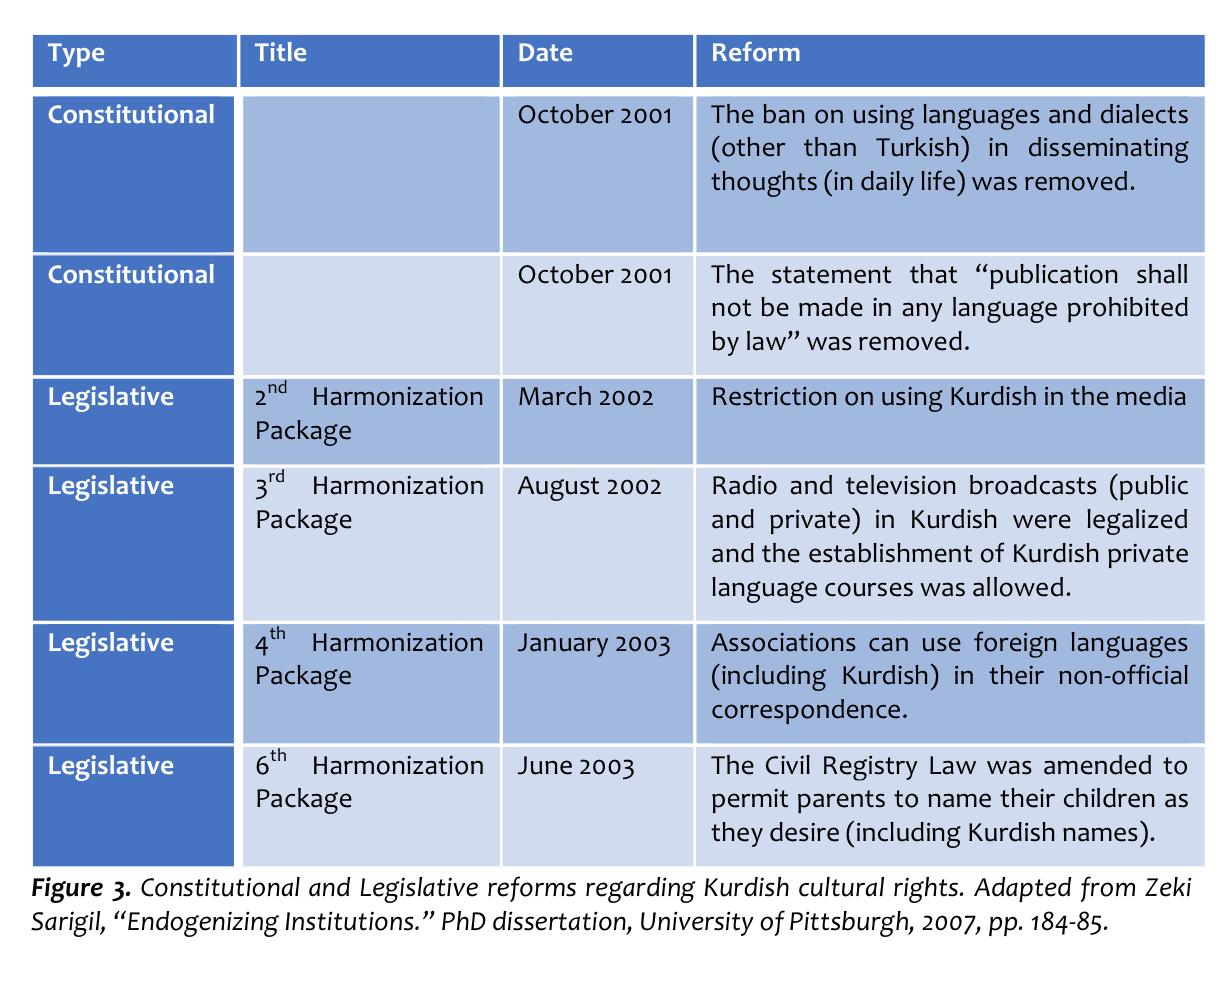 an analysis of the kurdish origin What is another word for analysis situs what is another word for analyst what is the kurdish word for analysis what is the kyrgyz word for analysis.